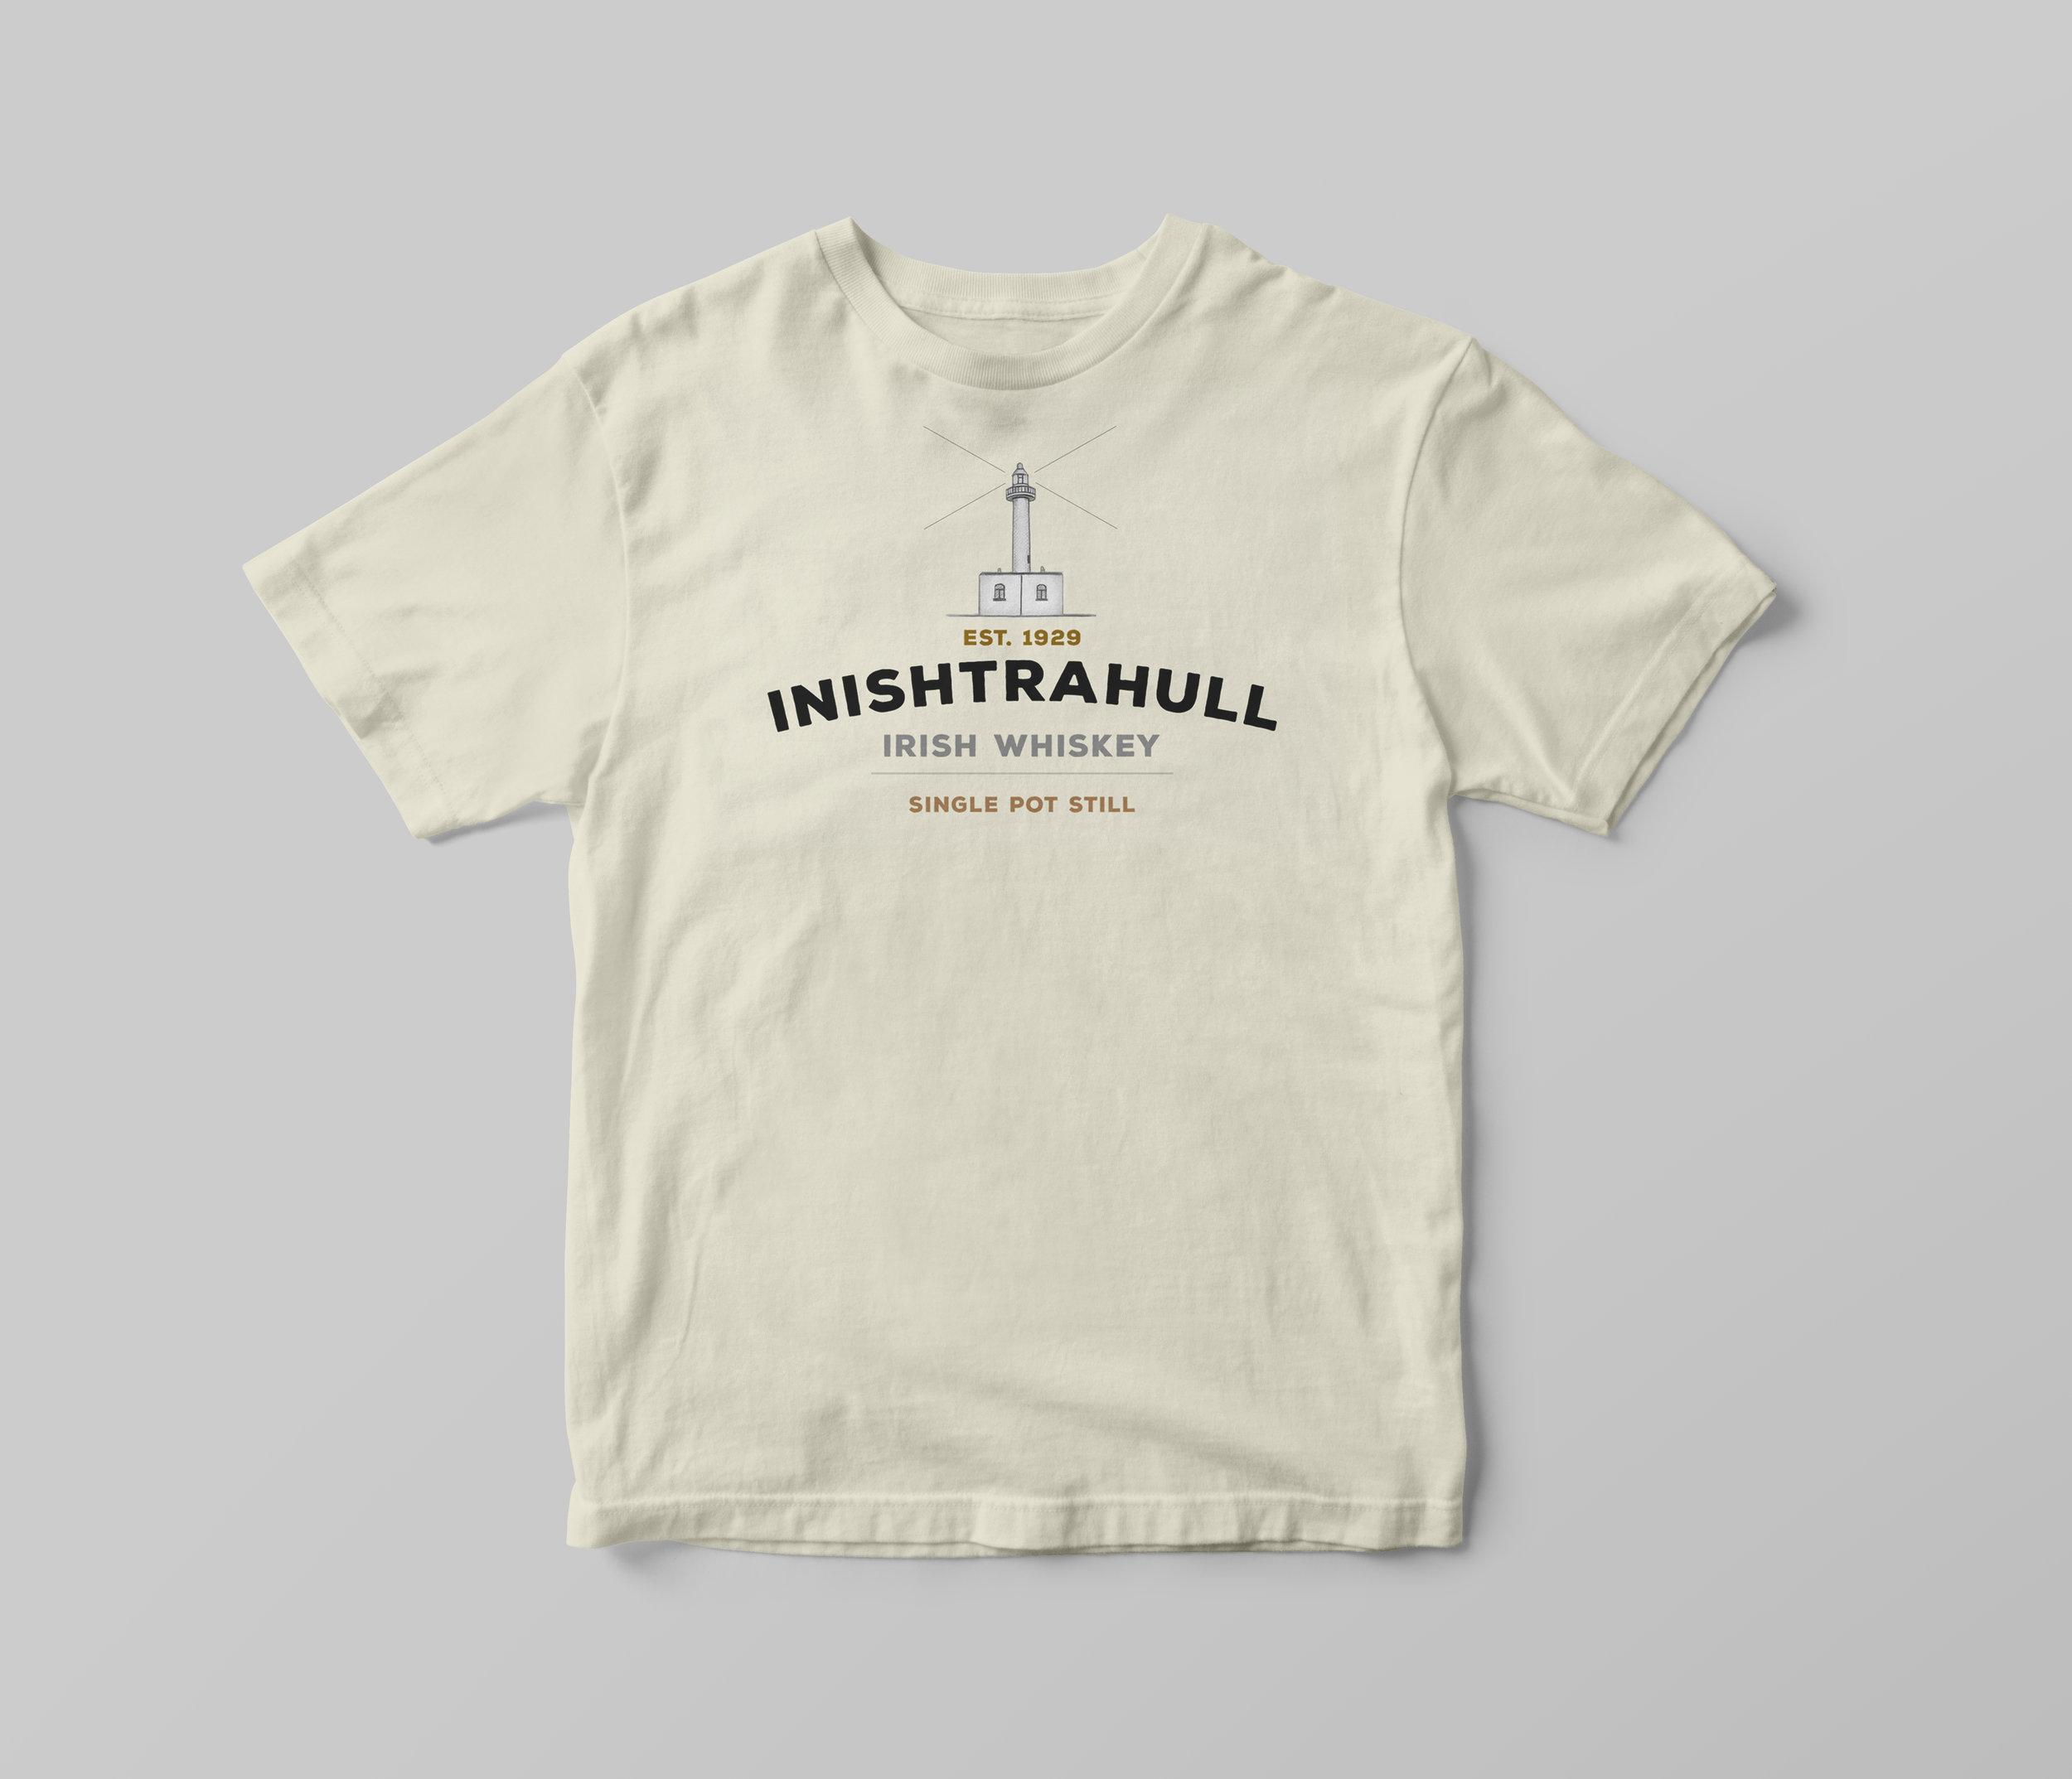 Inishtrahull_Tshirt Mockup2.jpg